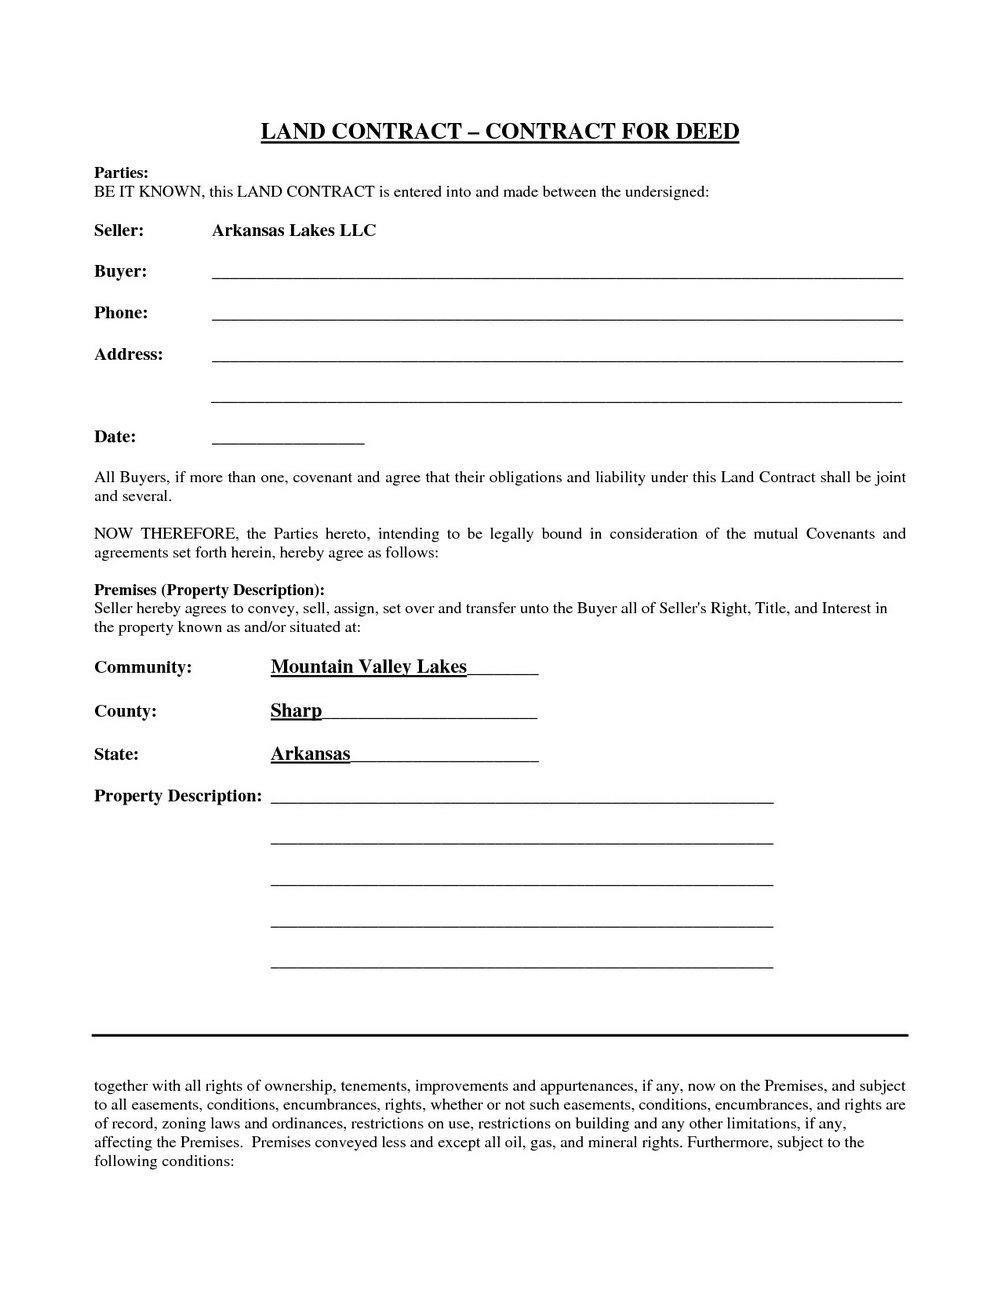 Free Printable Michigan Land Contract Form Pdf #169 - Ocweb - Free Printable Land Contract Forms